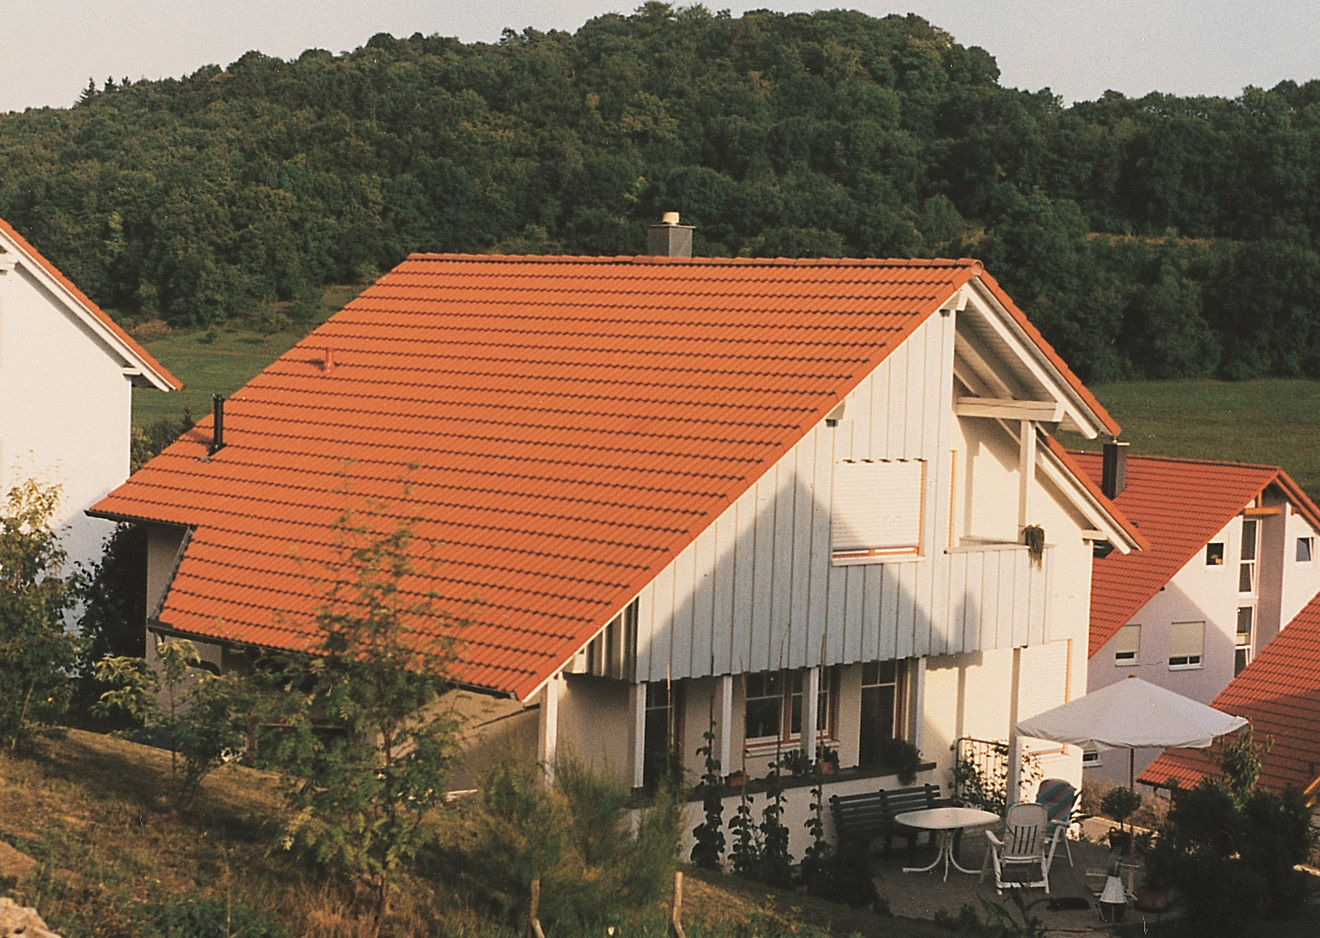 Wohnhausneubau mit festem Etat bei hoher Qualität